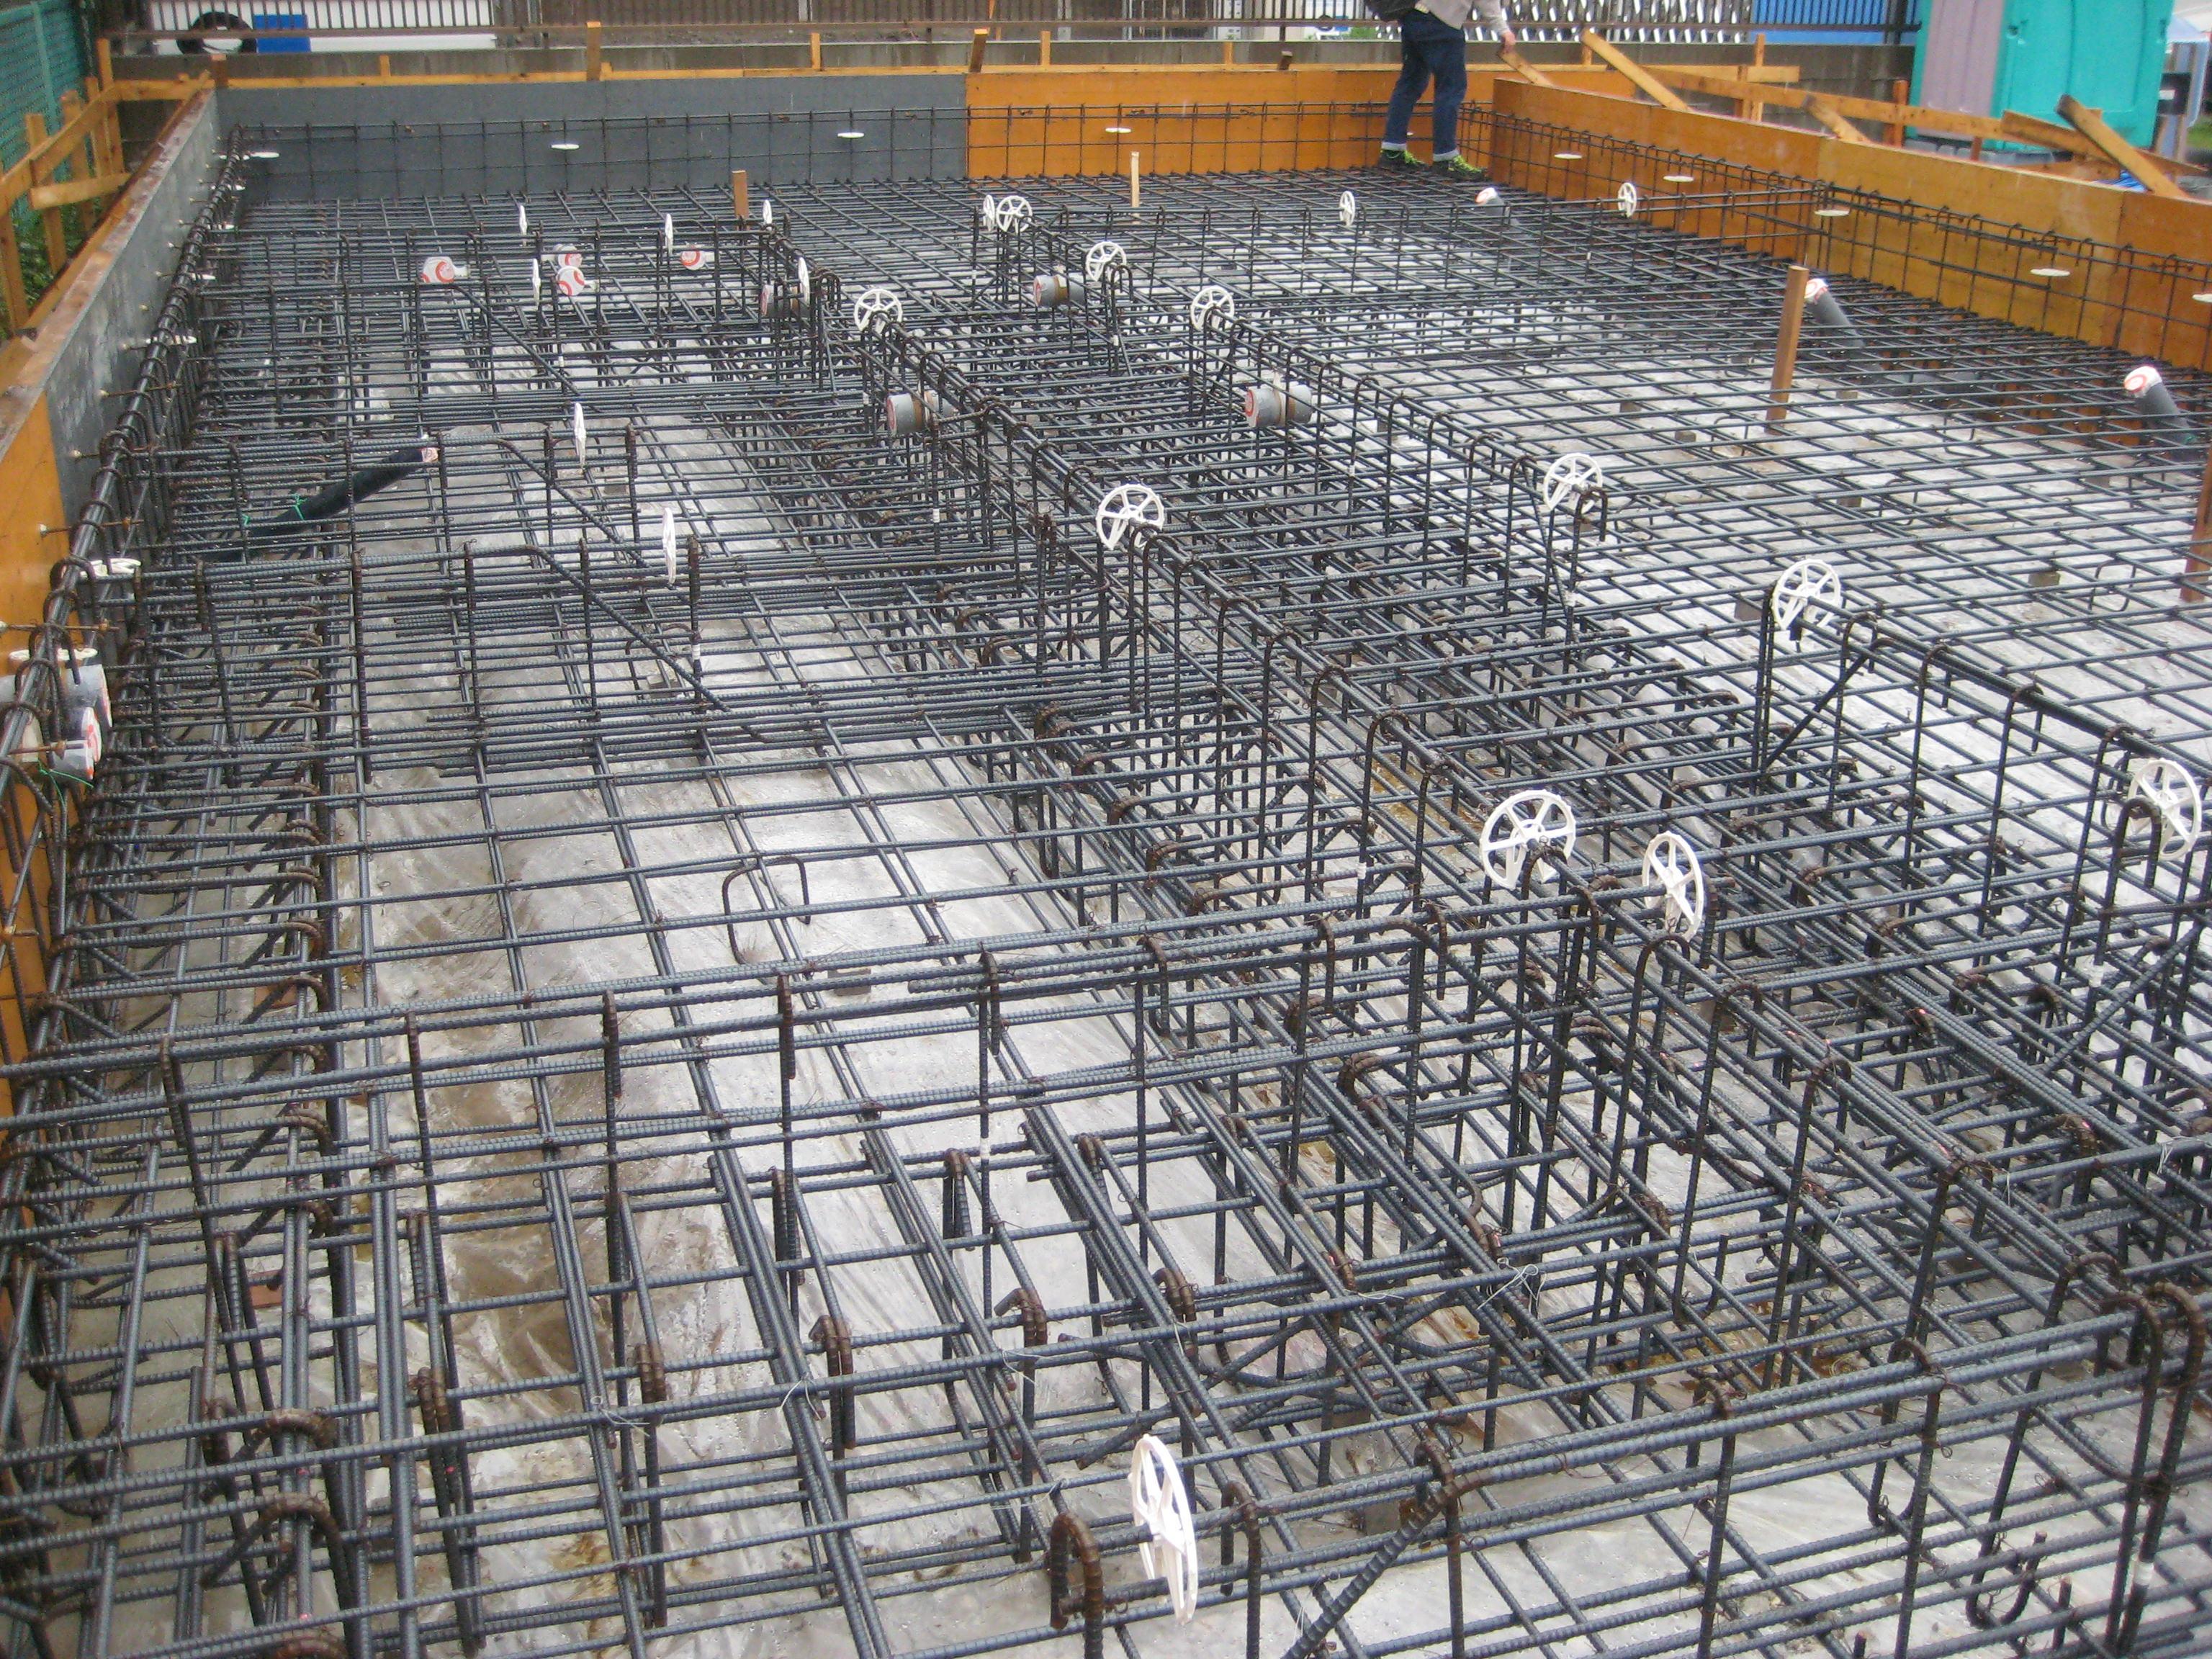 愛知県あま市甚目寺「大渕の家」木造2階建 2世帯  配筋検査